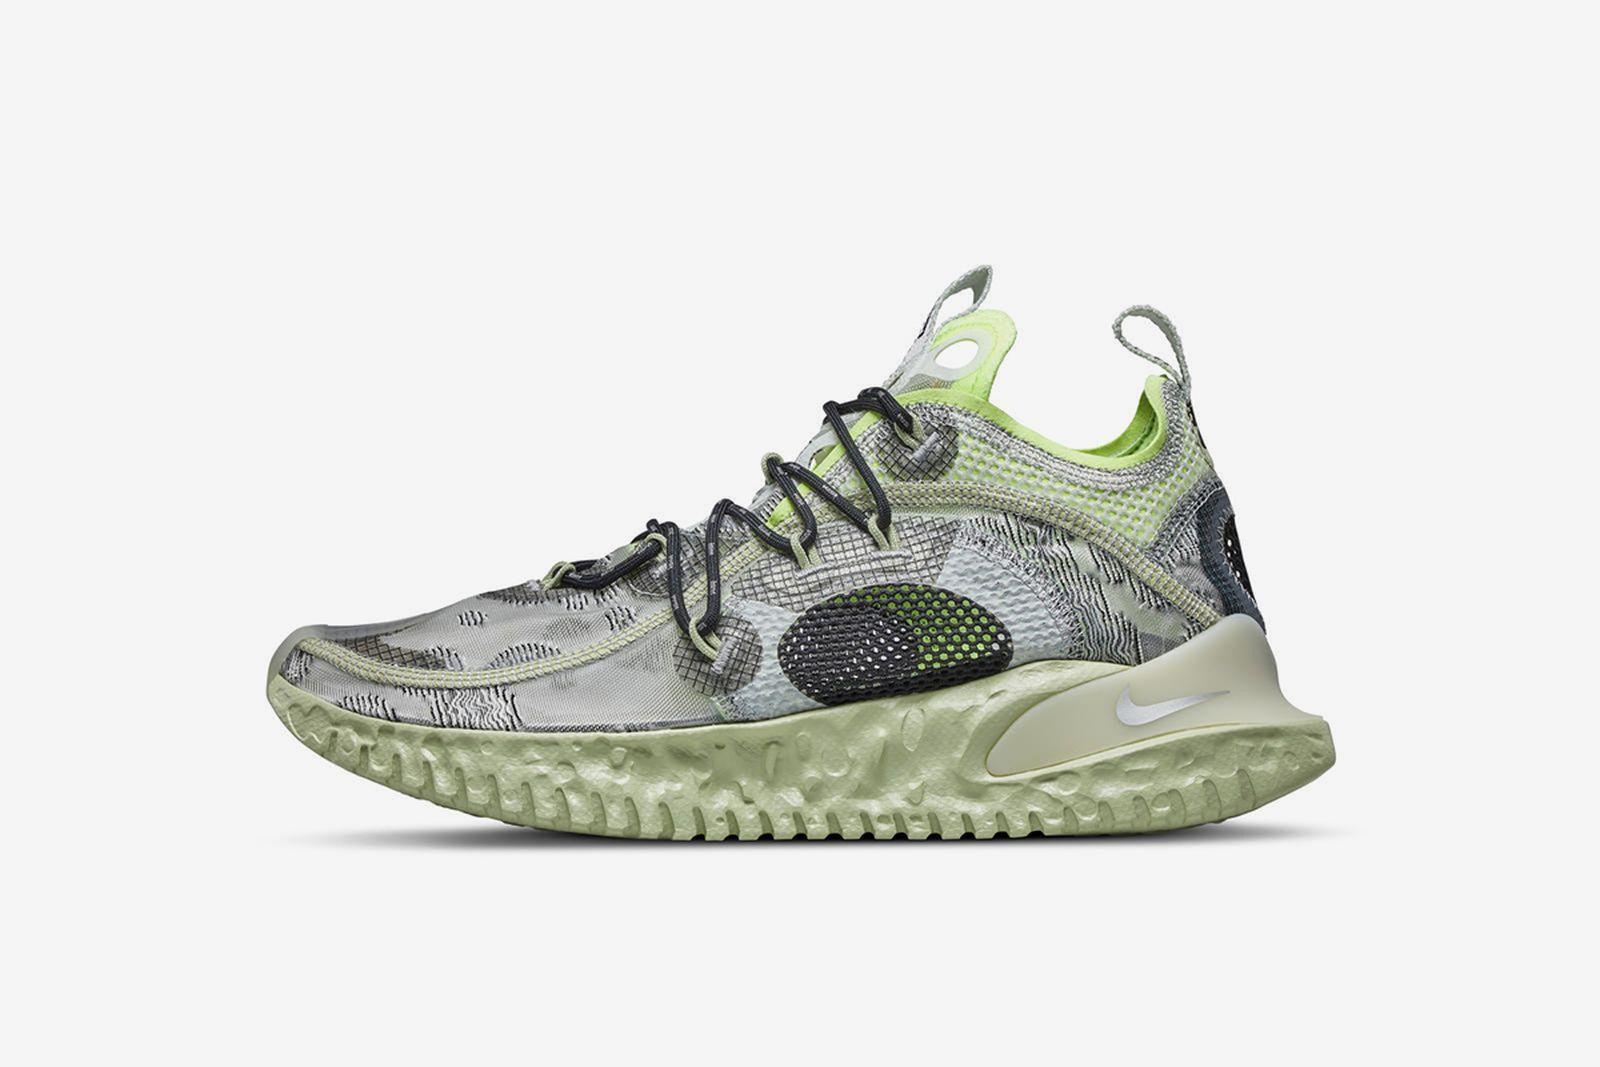 Nike ISPA Flow 2020